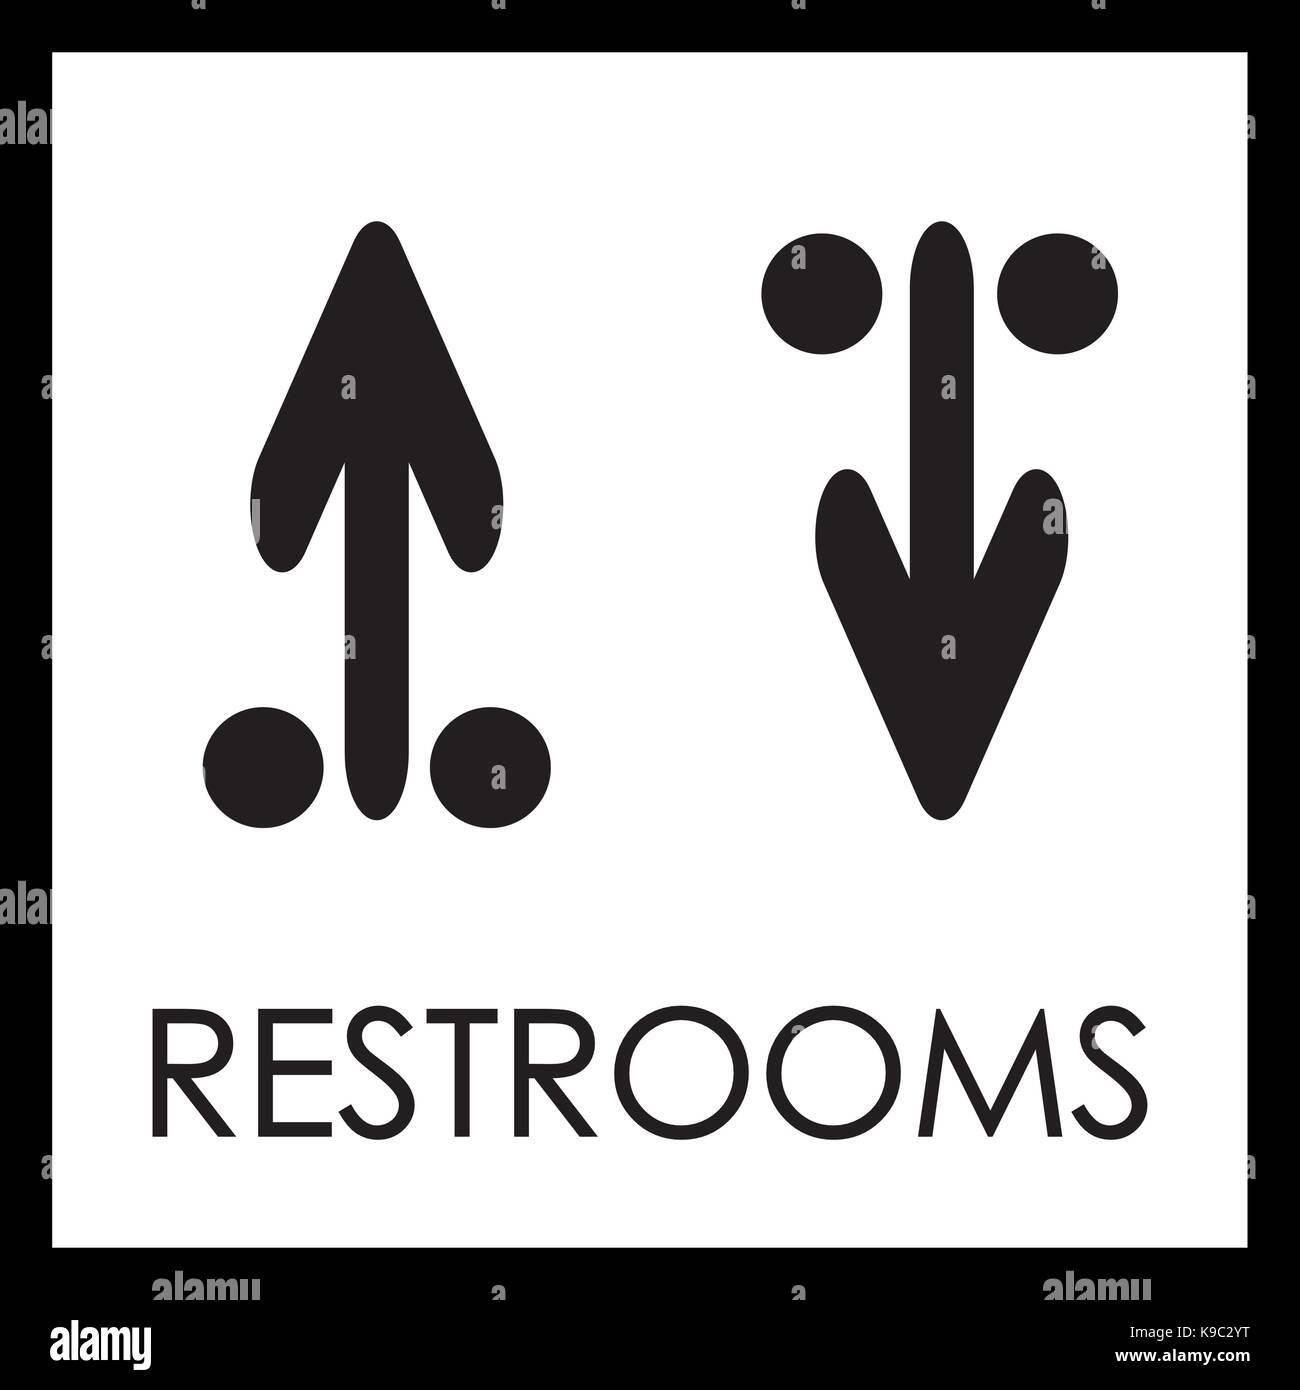 Toilet Notice Stock Photos & Toilet Notice Stock Images - Alamy